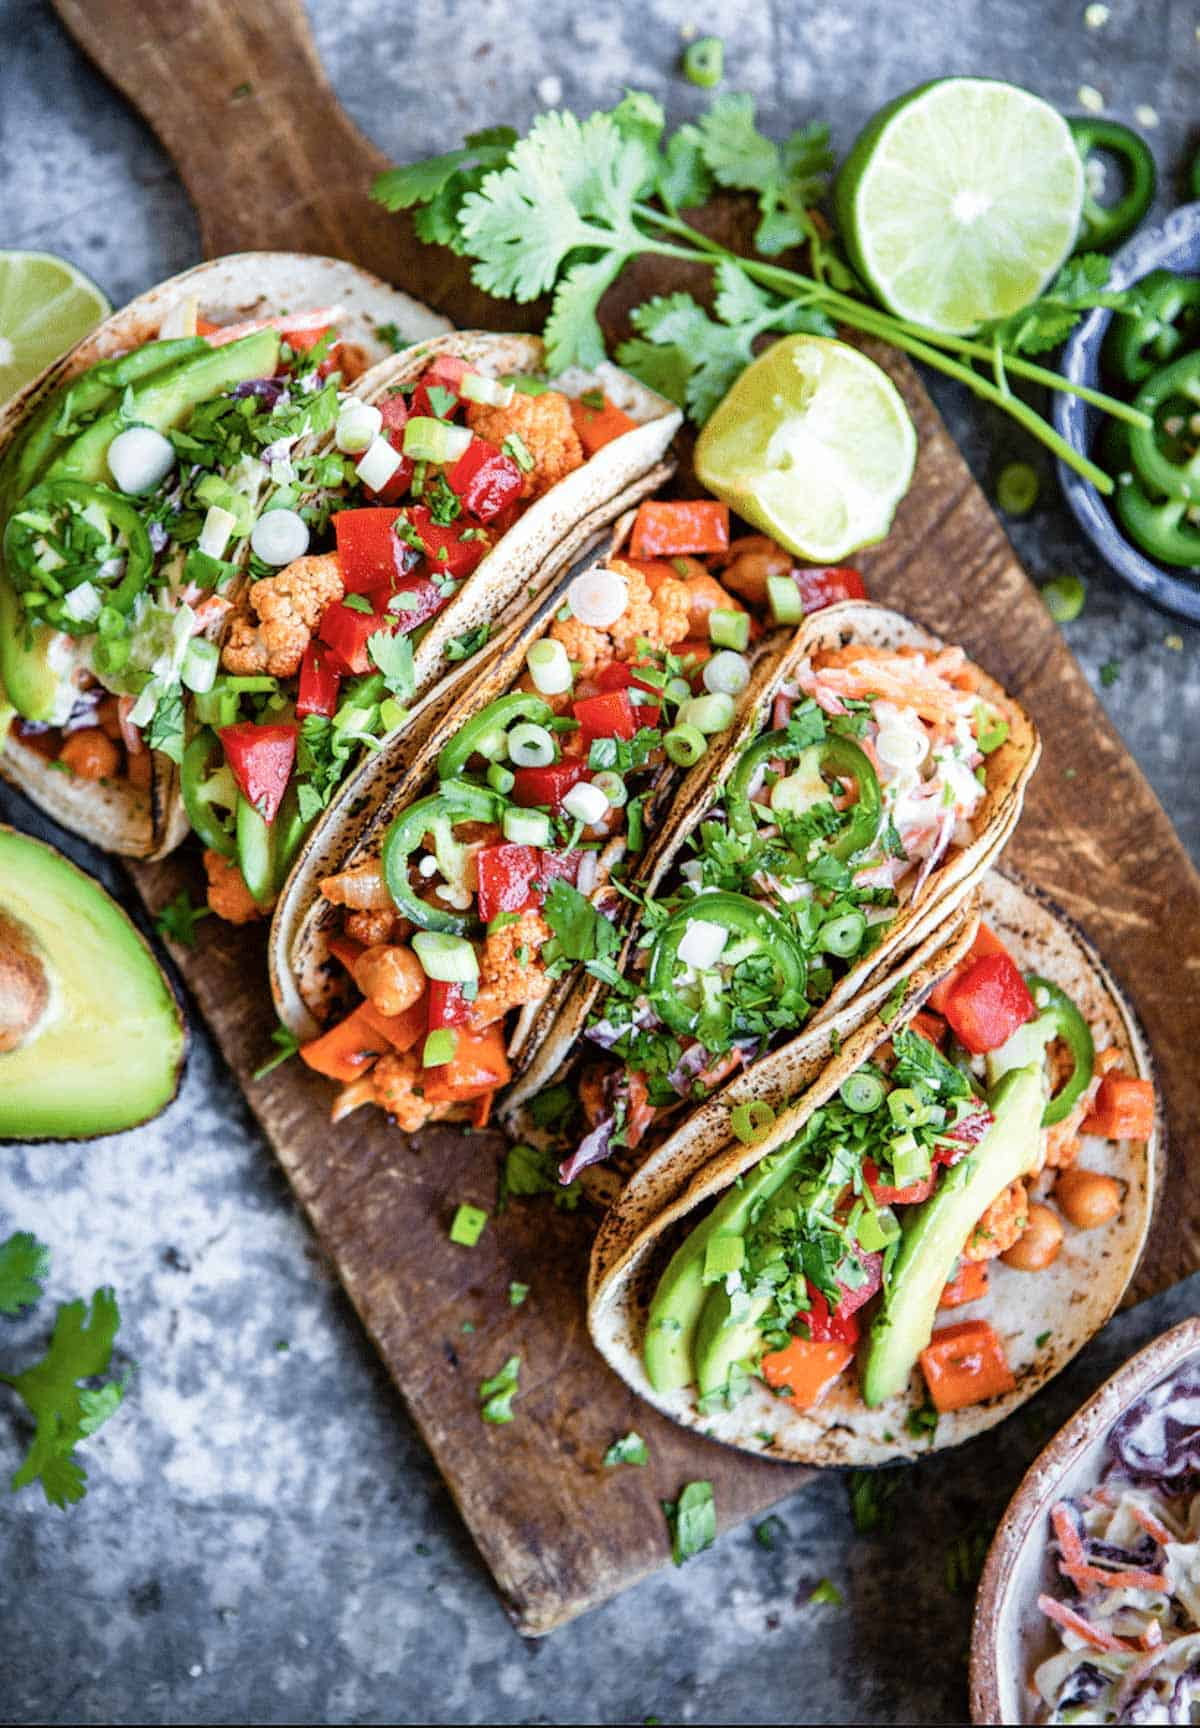 Vegan tacos with Austin vibe